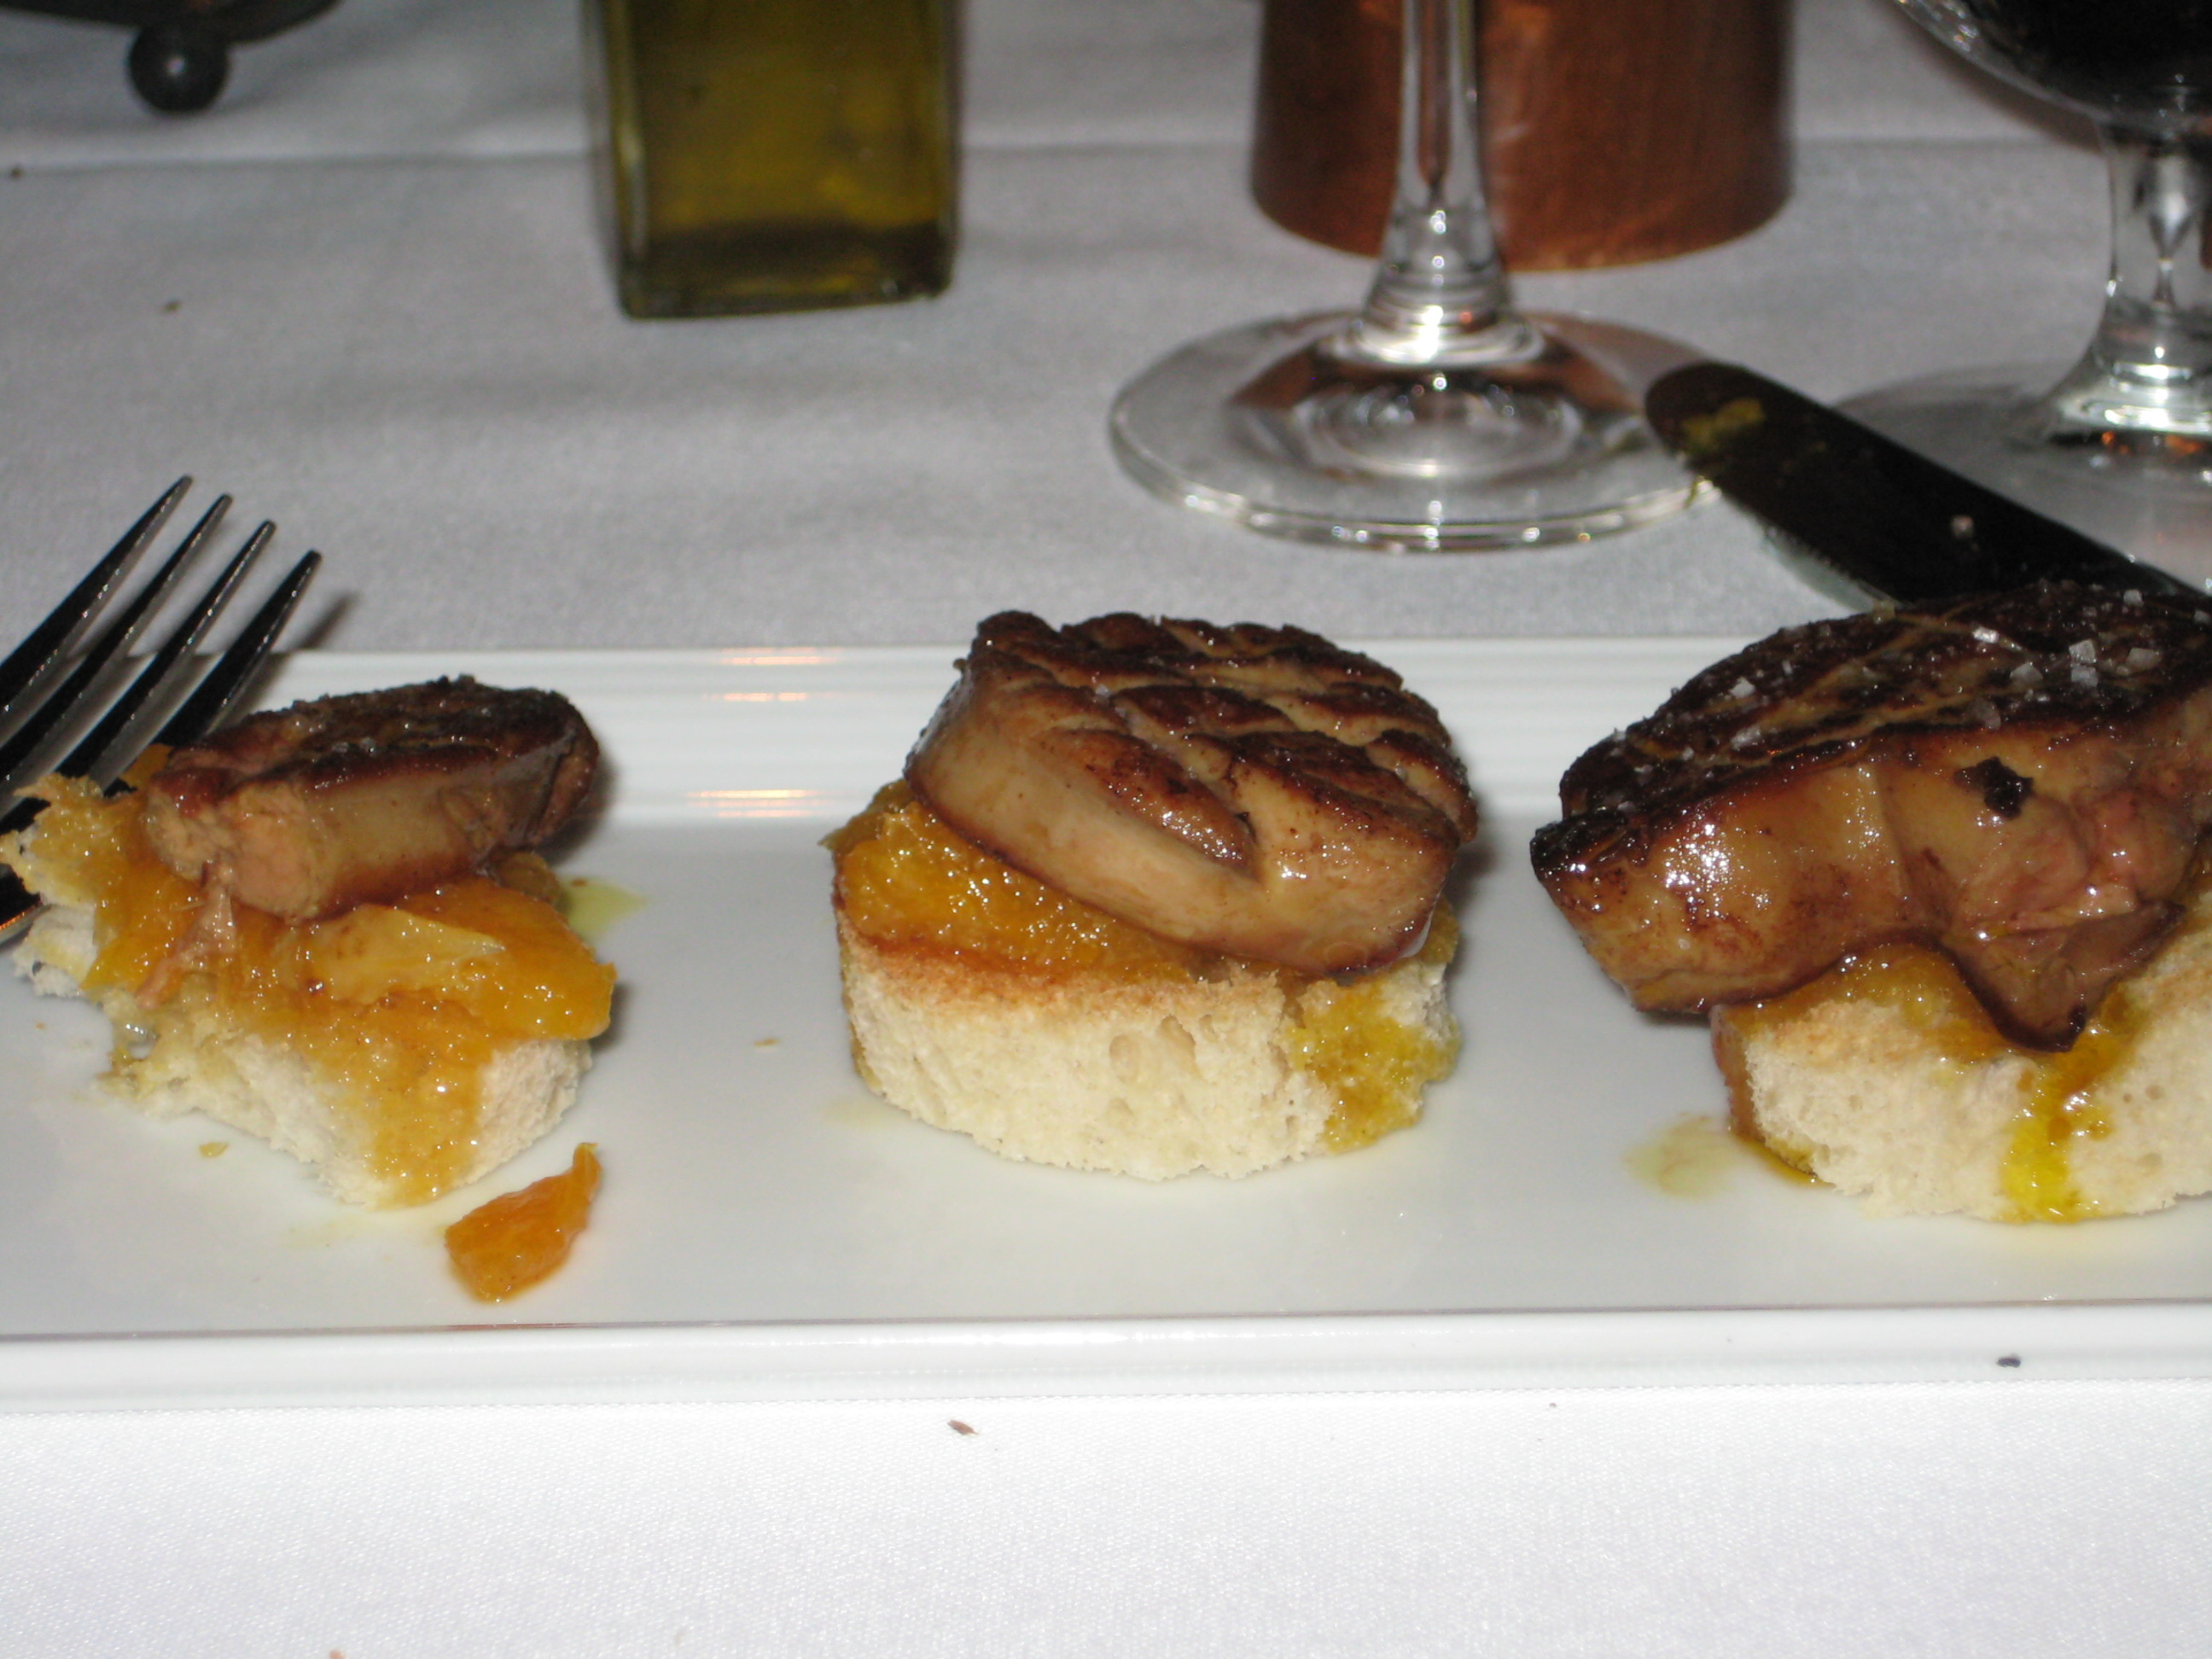 Foie Gras Crostini with Oranges - deeeeelish